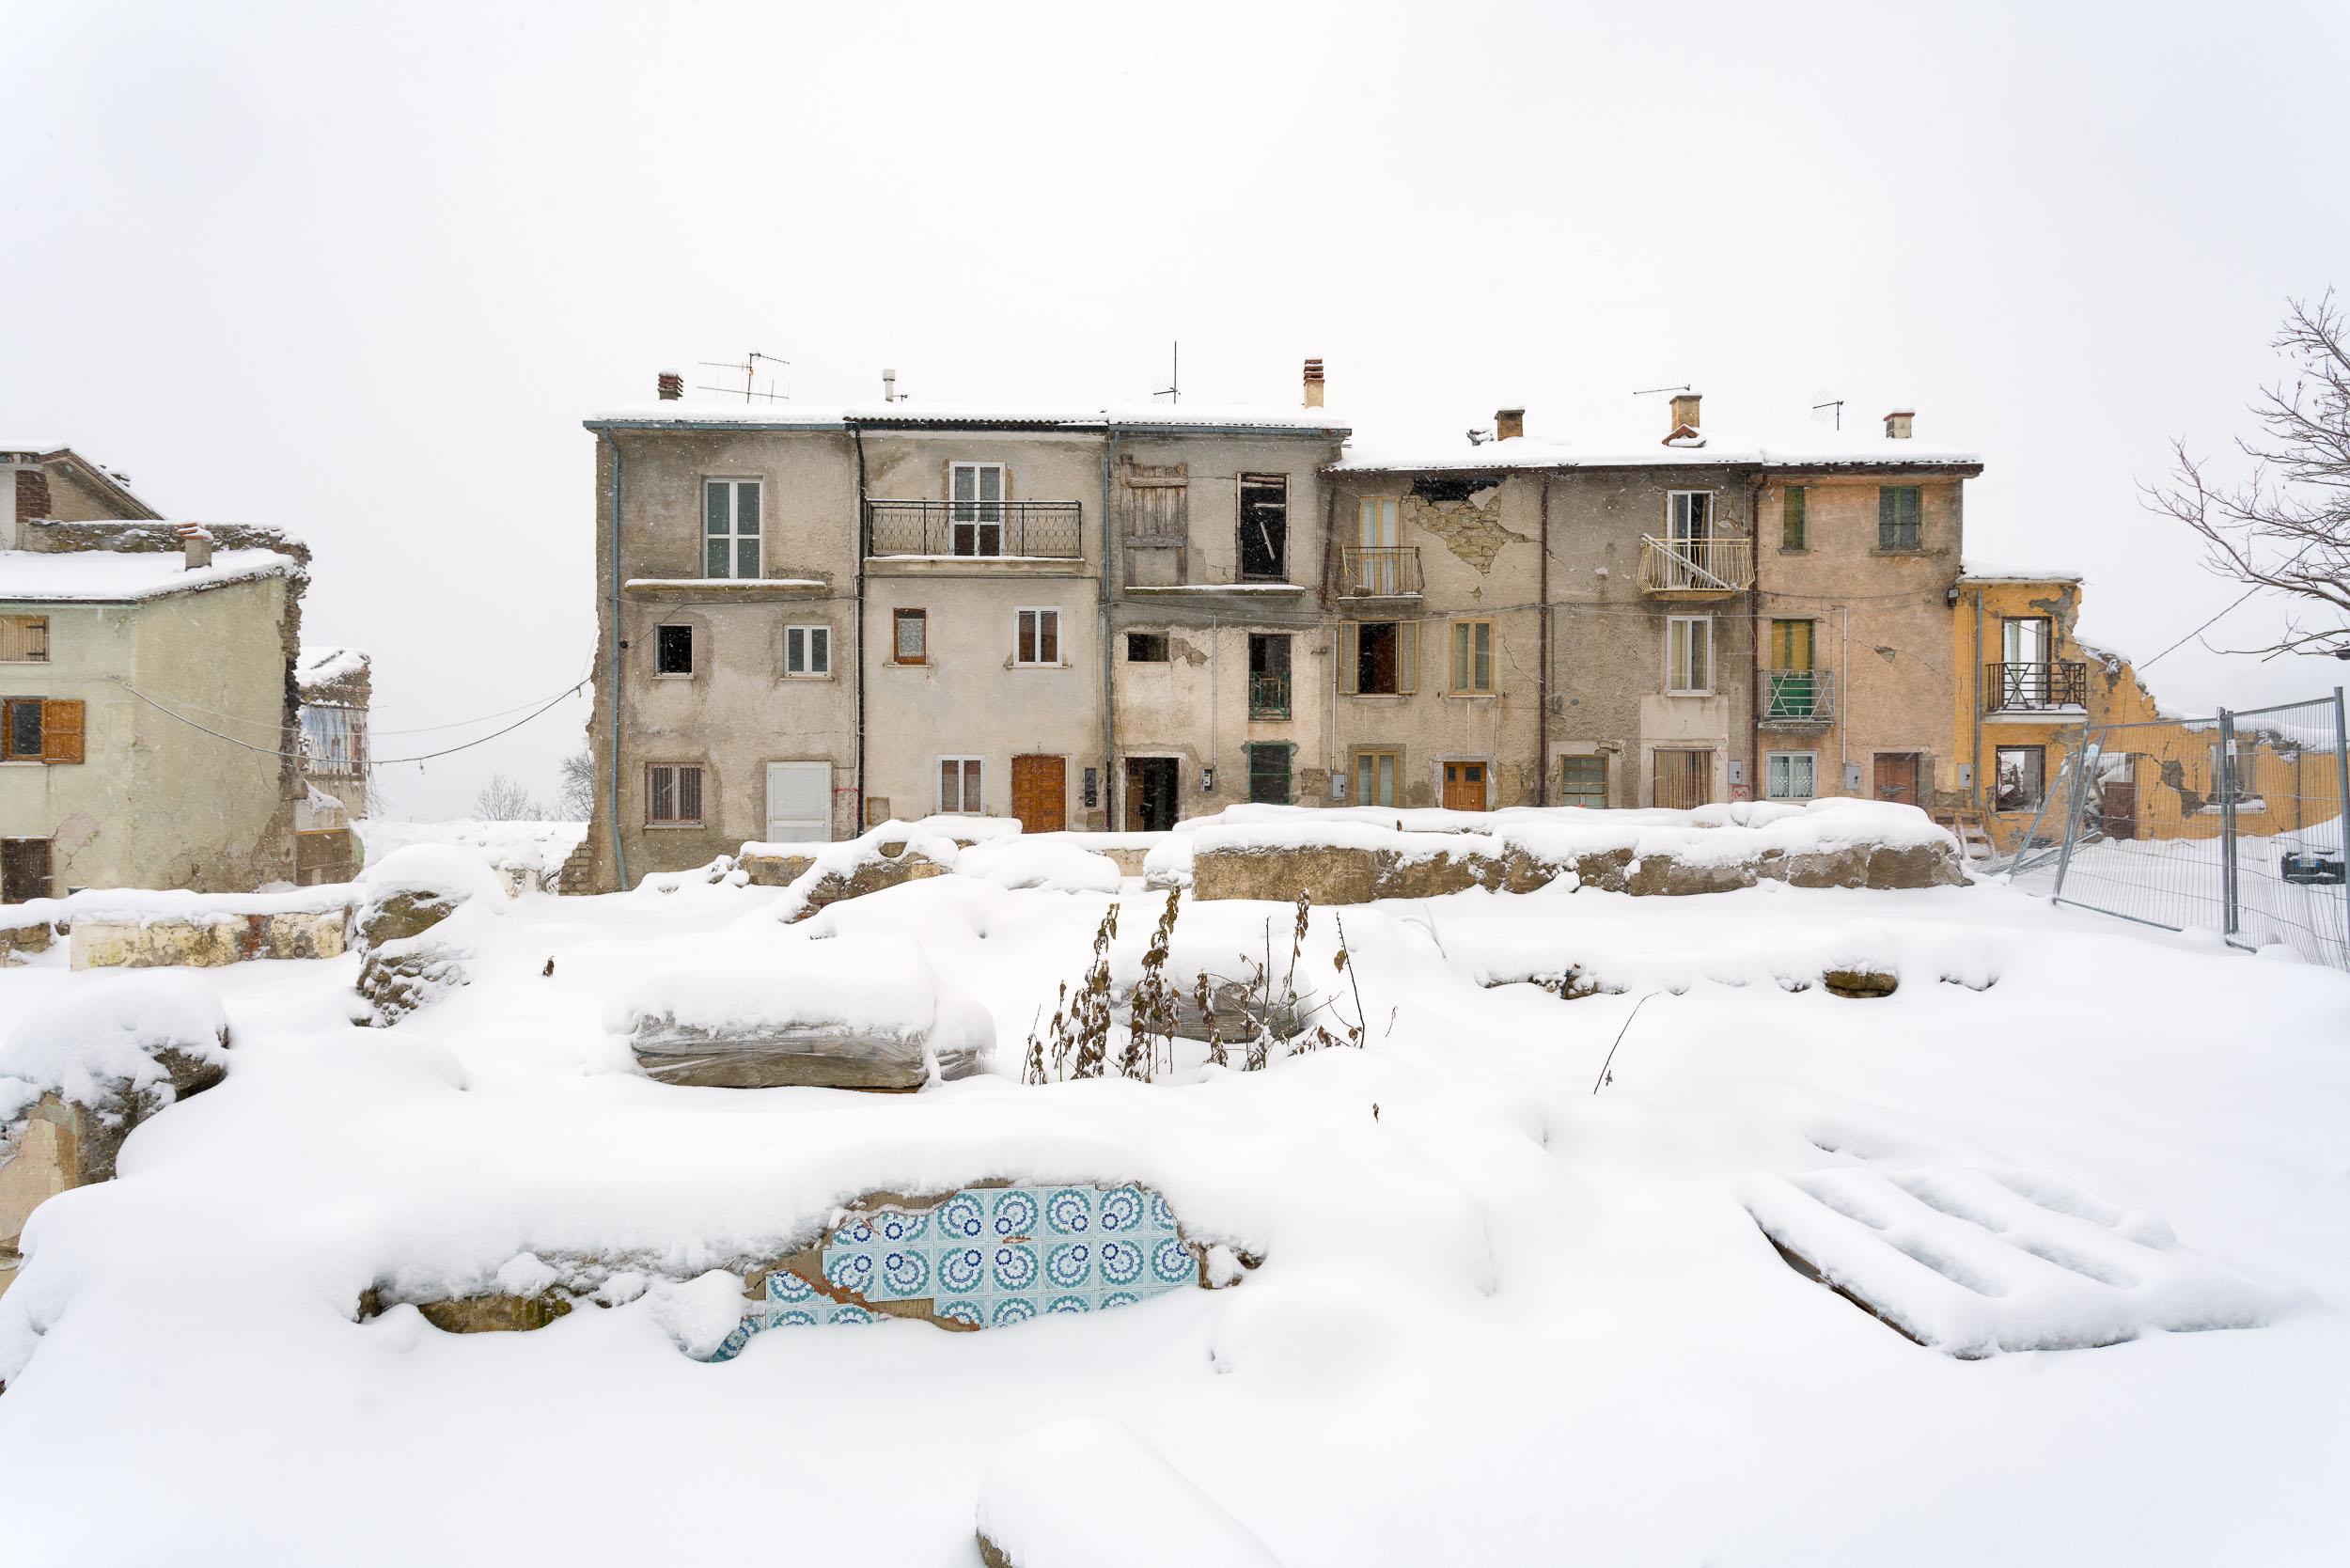 002-Campotosto_GAB3201M-Gabriele Lungarella.jpg